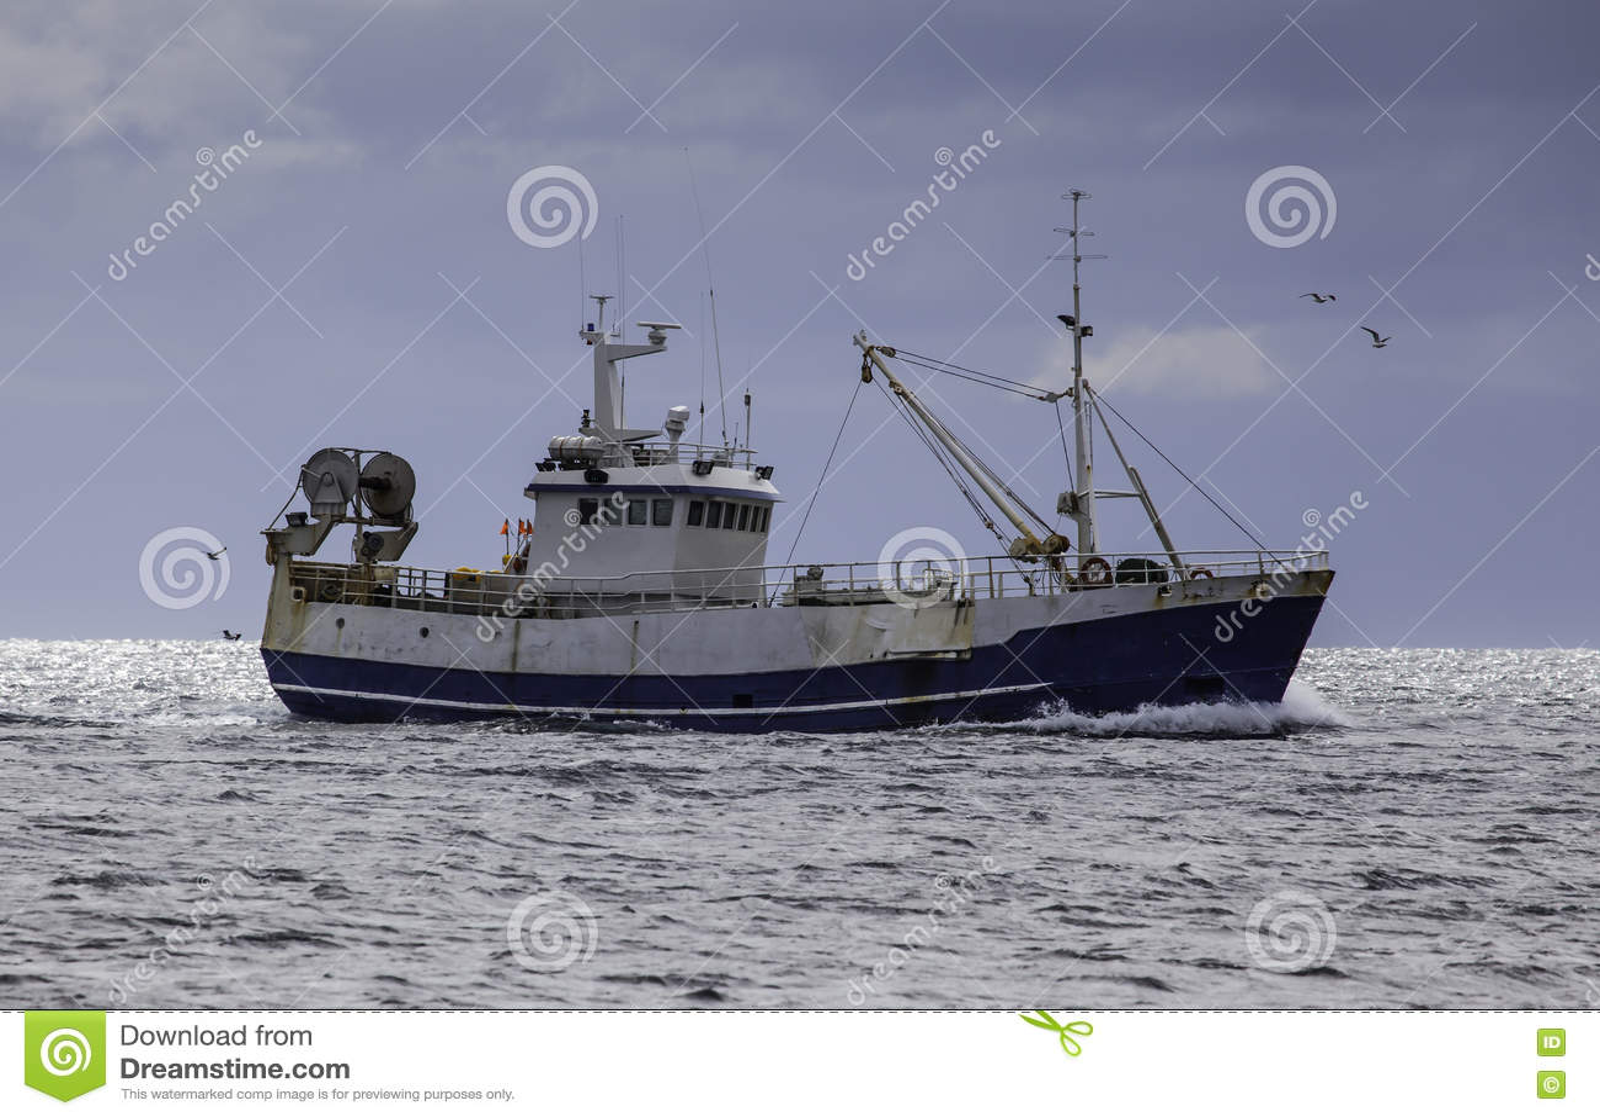 Fishing Boat stock photo. Image of norway, modern, seascape - 70655176